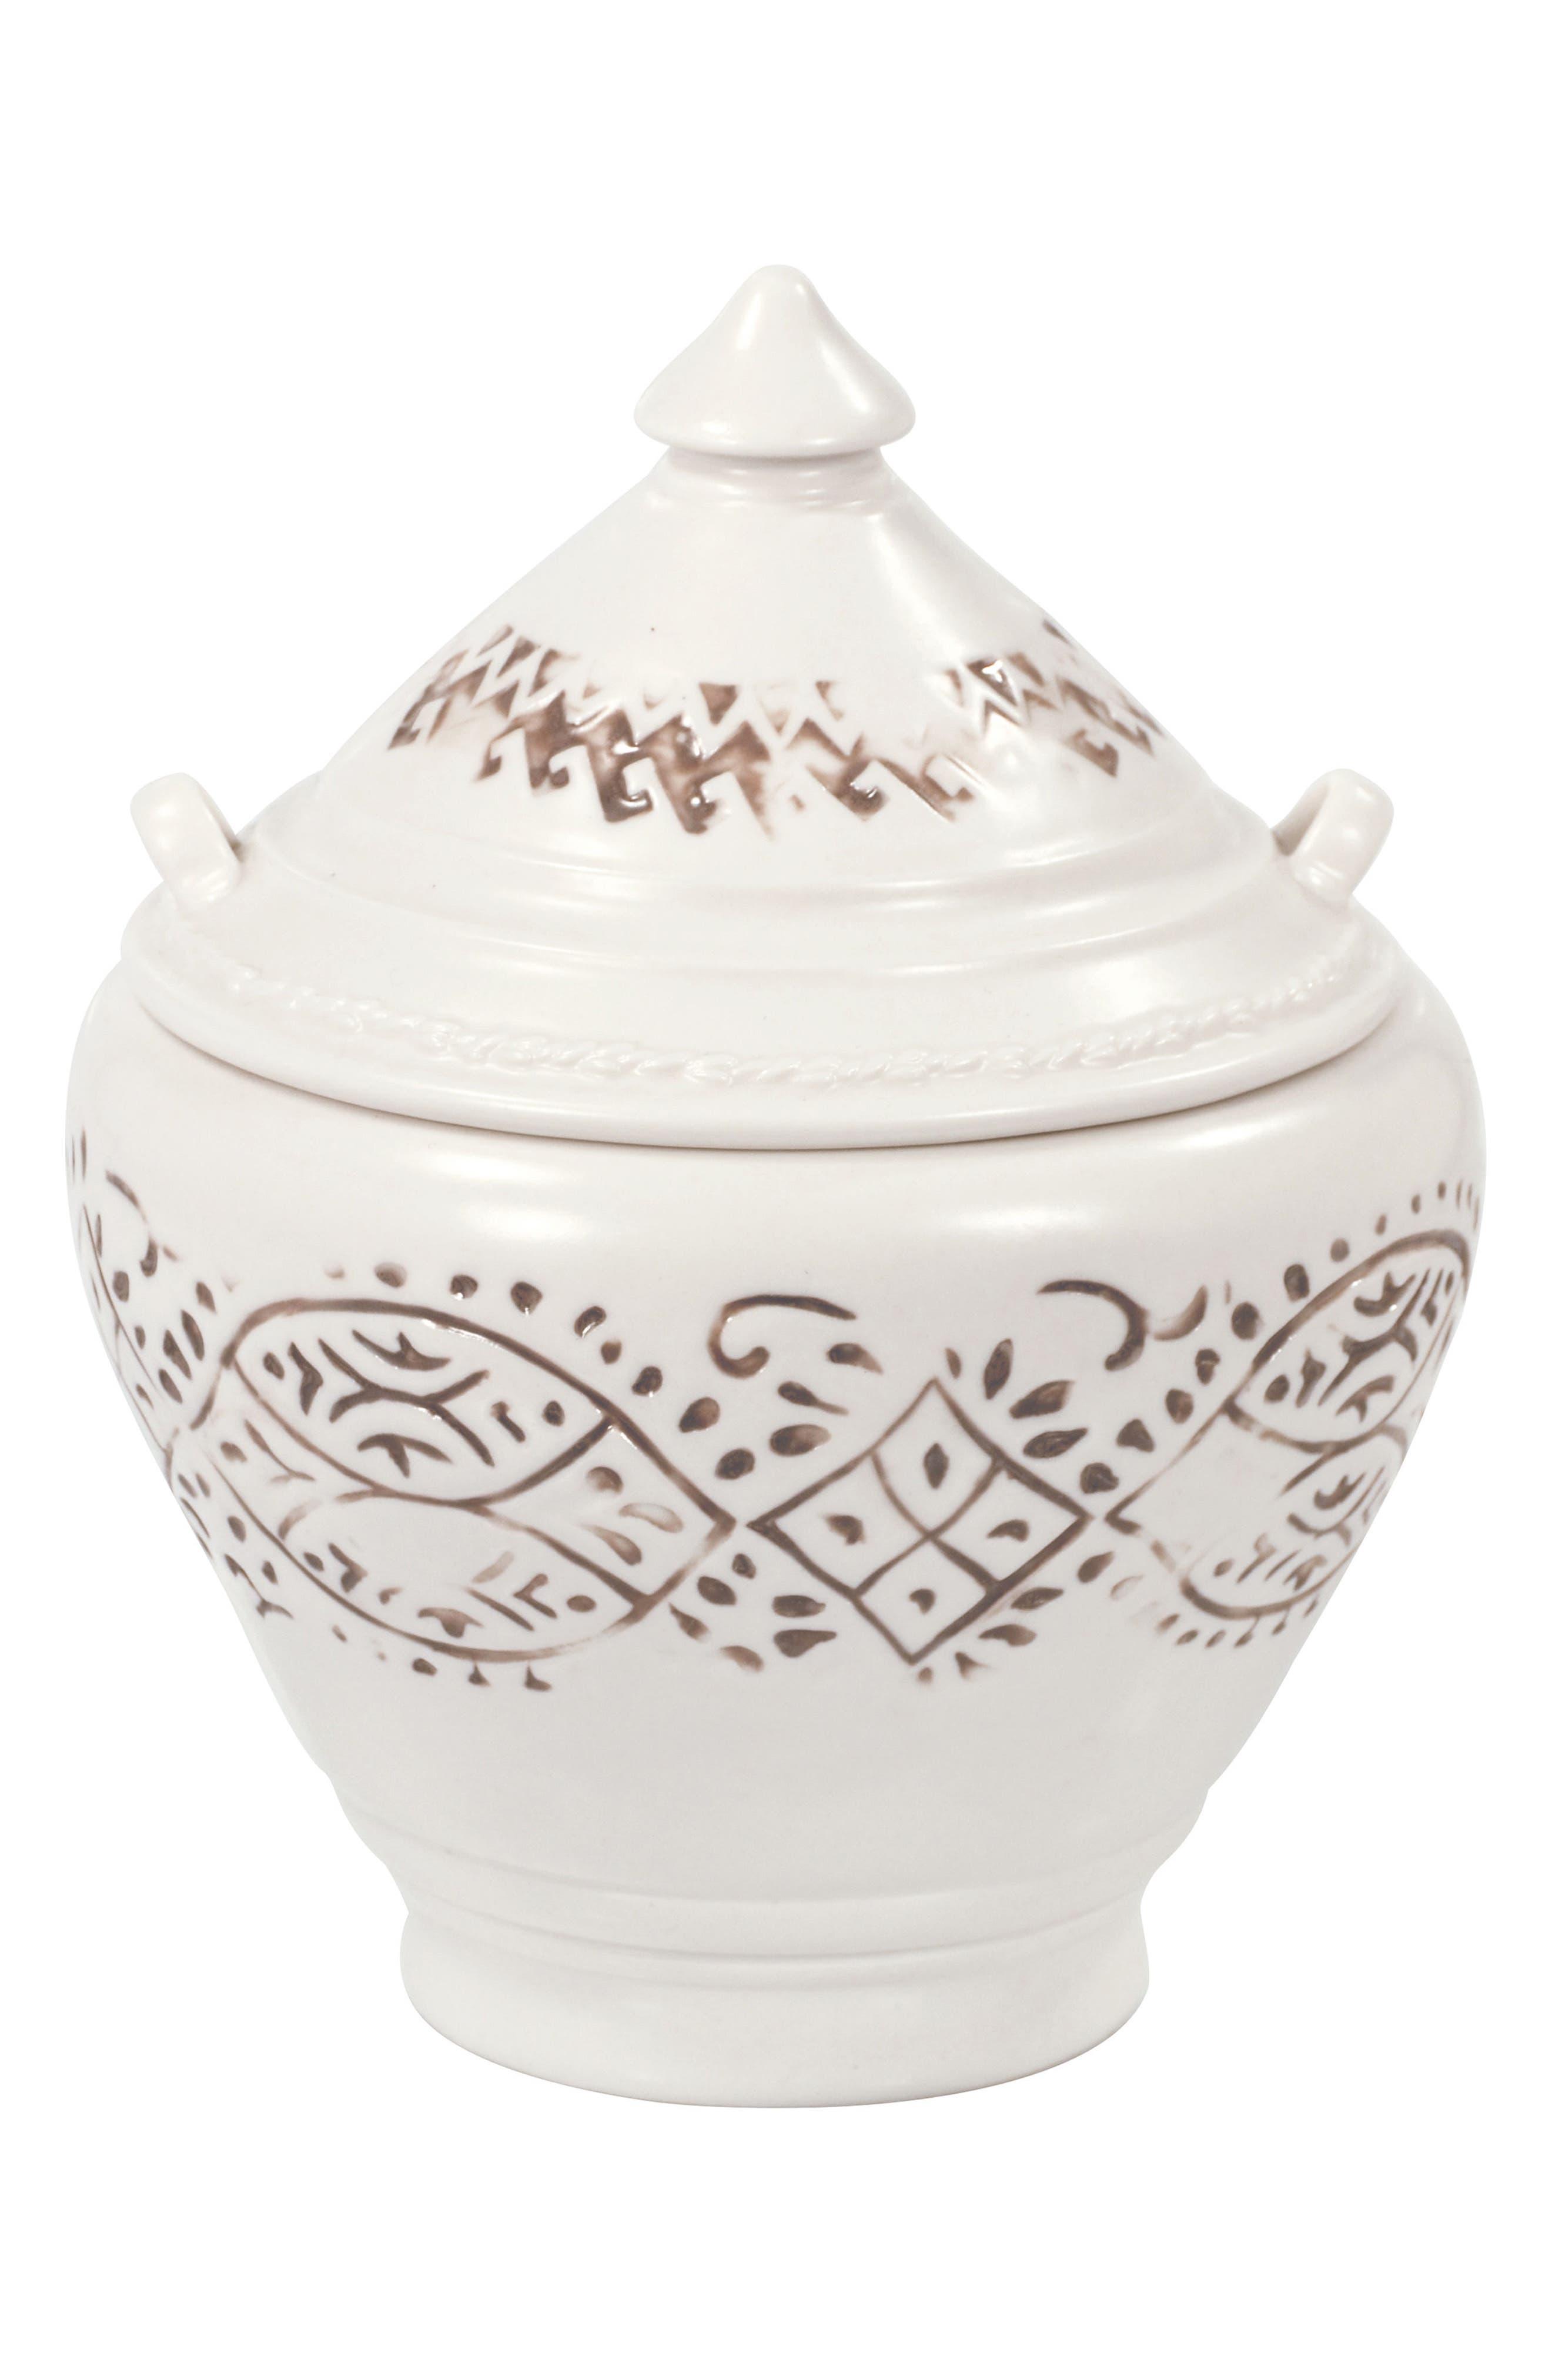 Lakki Covered Porcelain Jar,                             Main thumbnail 1, color,                             265